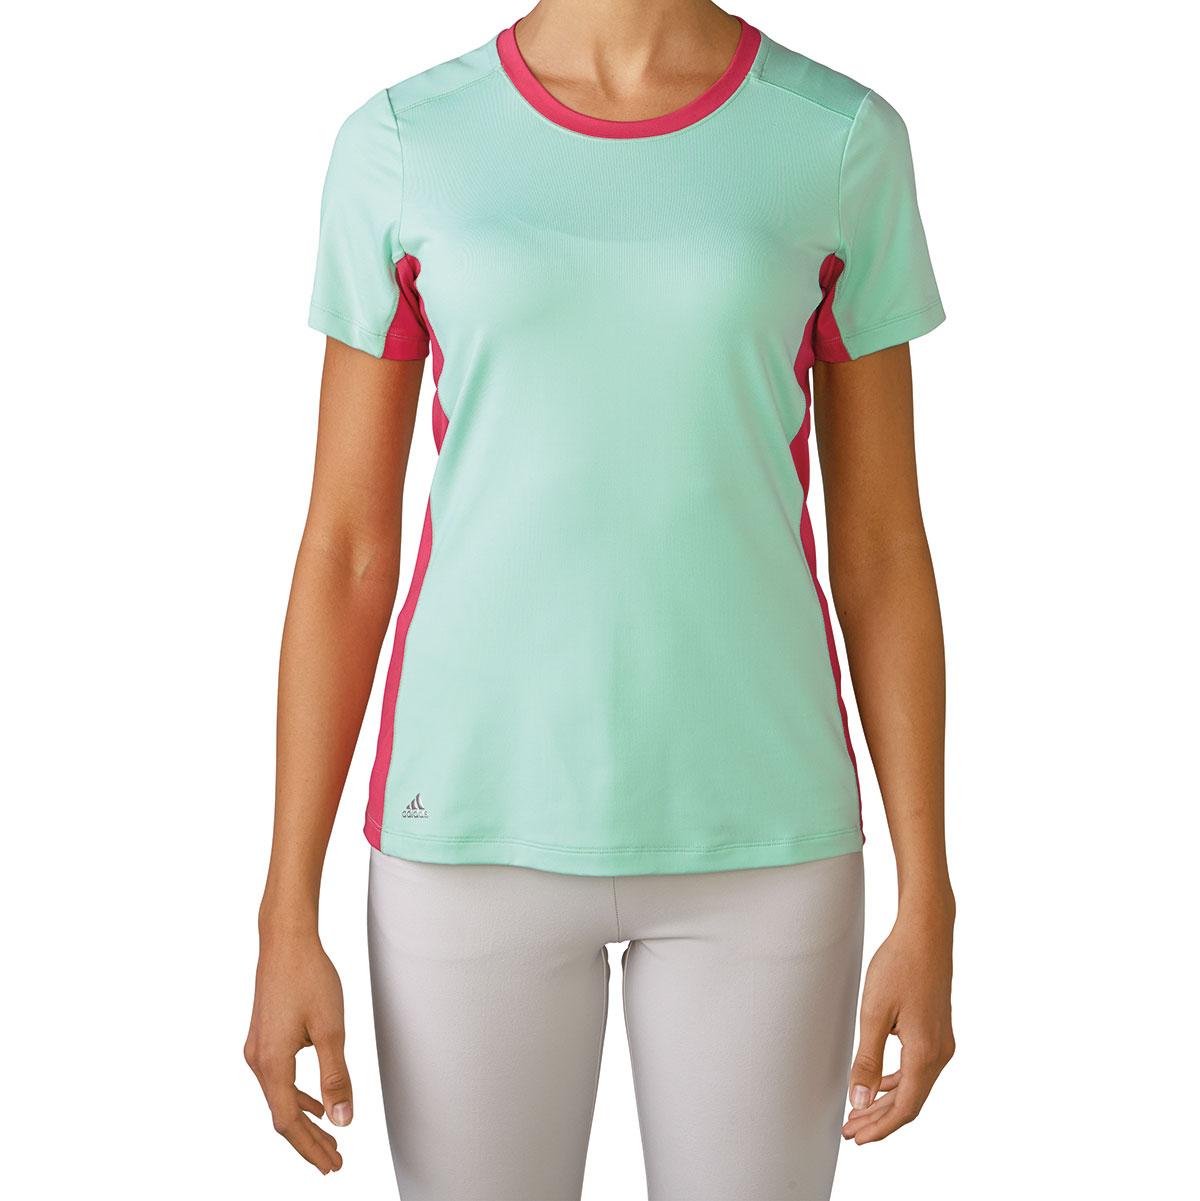 Adidas Womens Adistar Rangewear Mint Crew Shirt